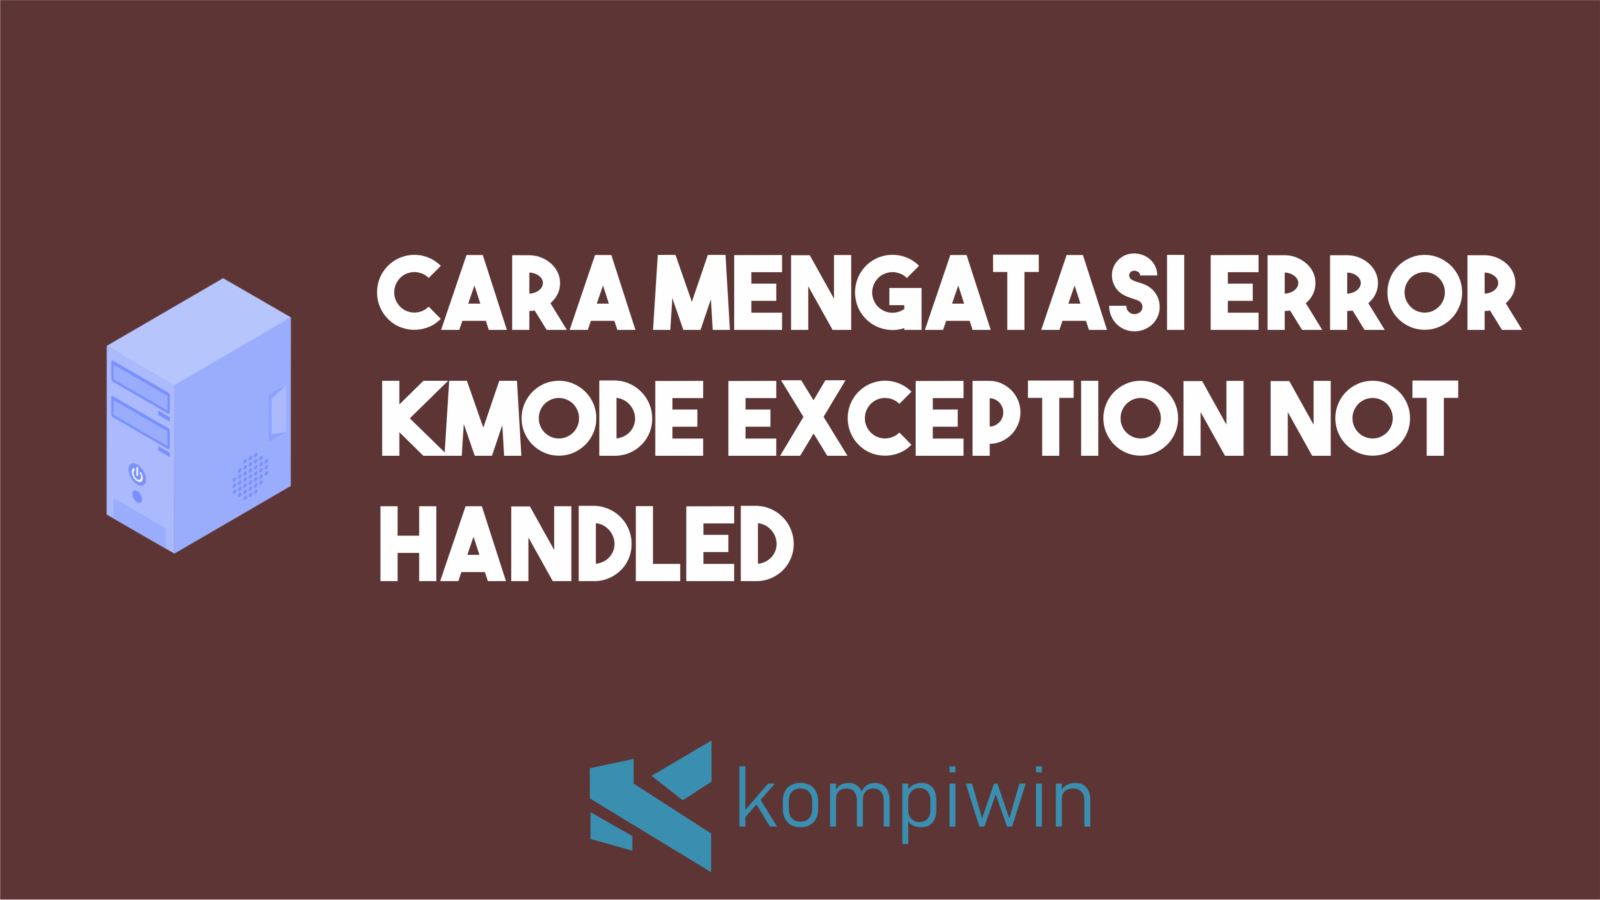 Cara Mengatasi Error Kmode Exception Not Handled 1